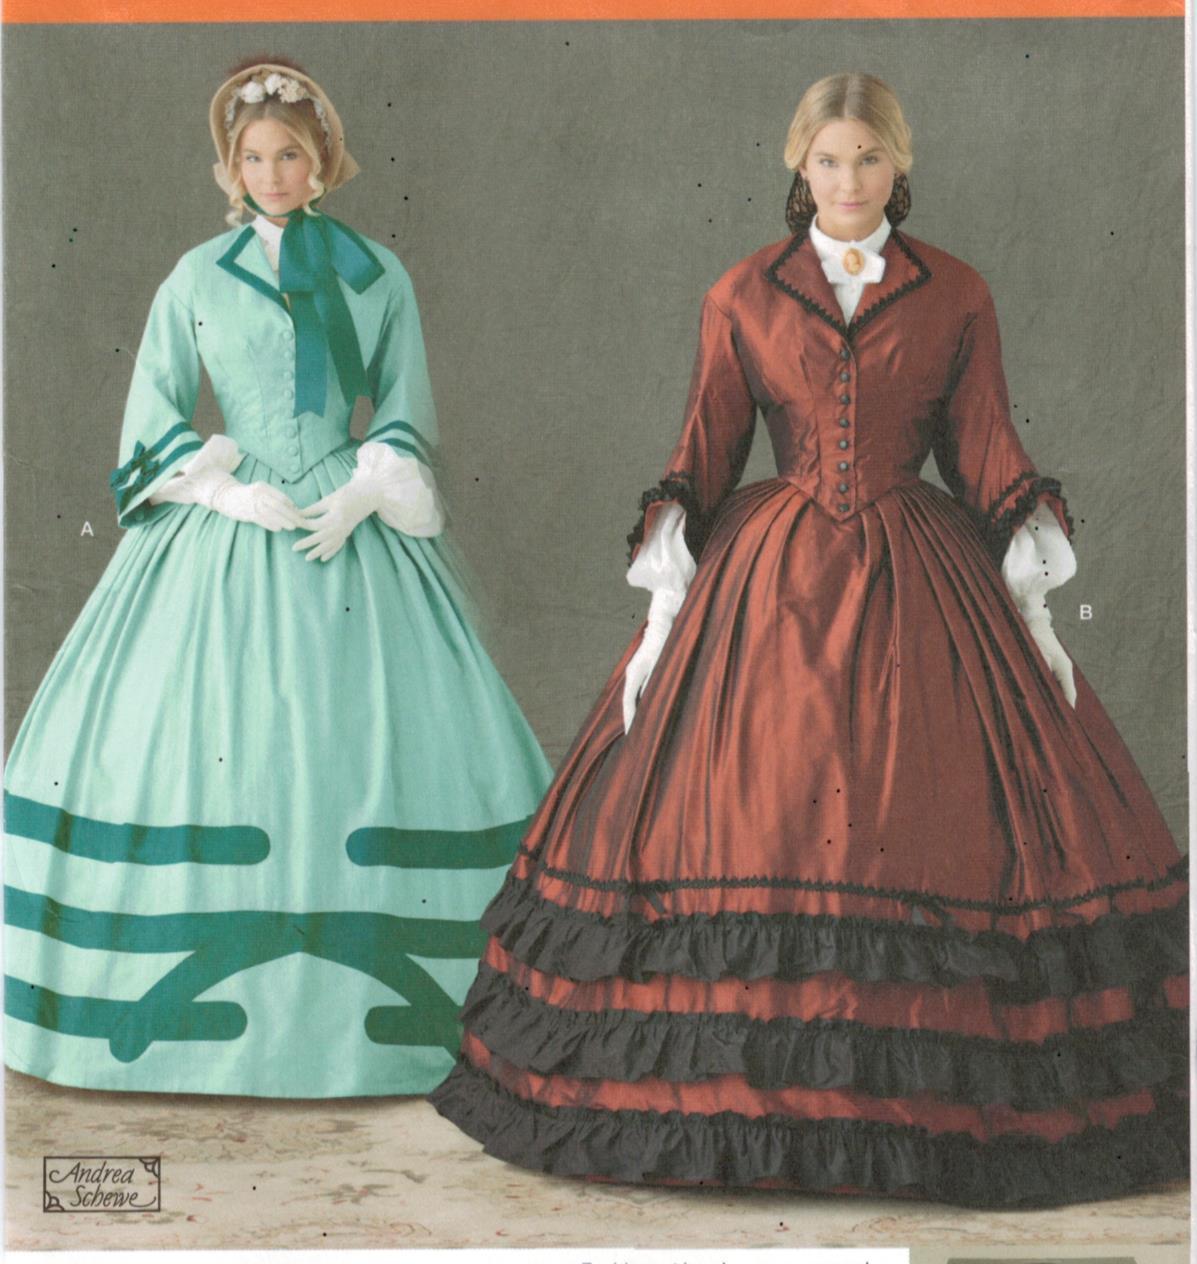 Simplicity Pattern 1818 Civil War Era ladies dress costumes sizes 8-14